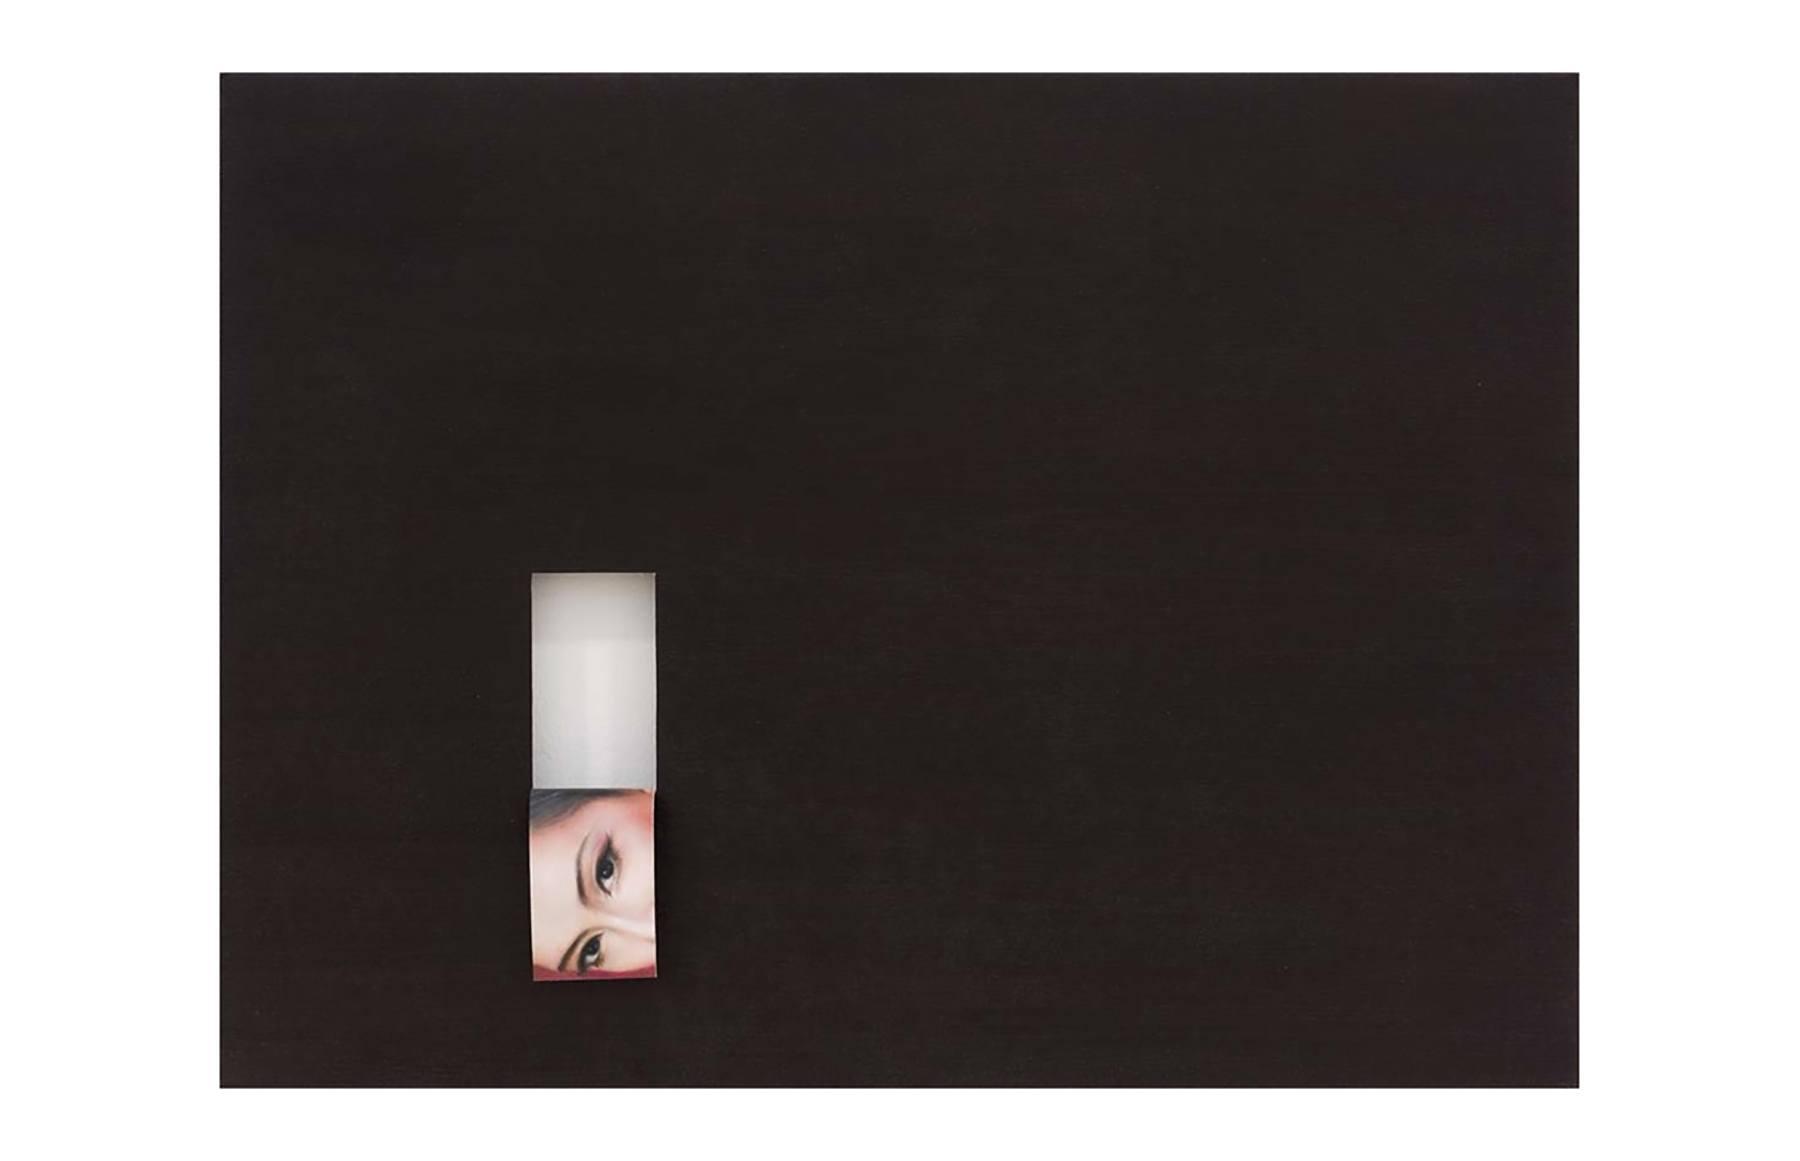 IGNANT-Art-Valeska-Soares-Doubleface-9